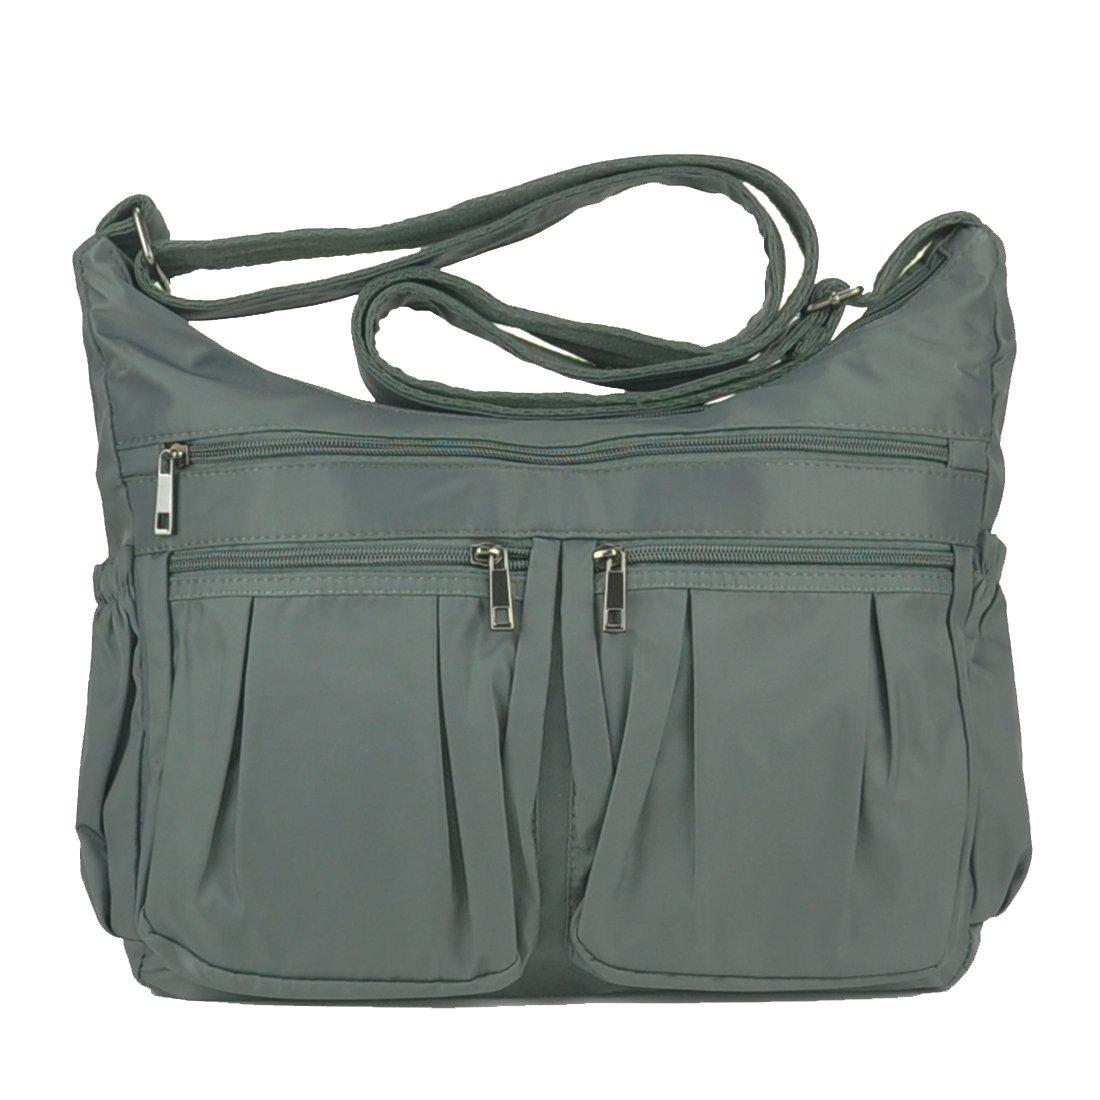 Lightweight Corss-body Purse Volcanic Rock Shoulder Bag(8981_Gray-Large) Volcanic Rock Shoulder Bag Corss-body Purse Waterproof Nylon Handbags with Zipper for Women